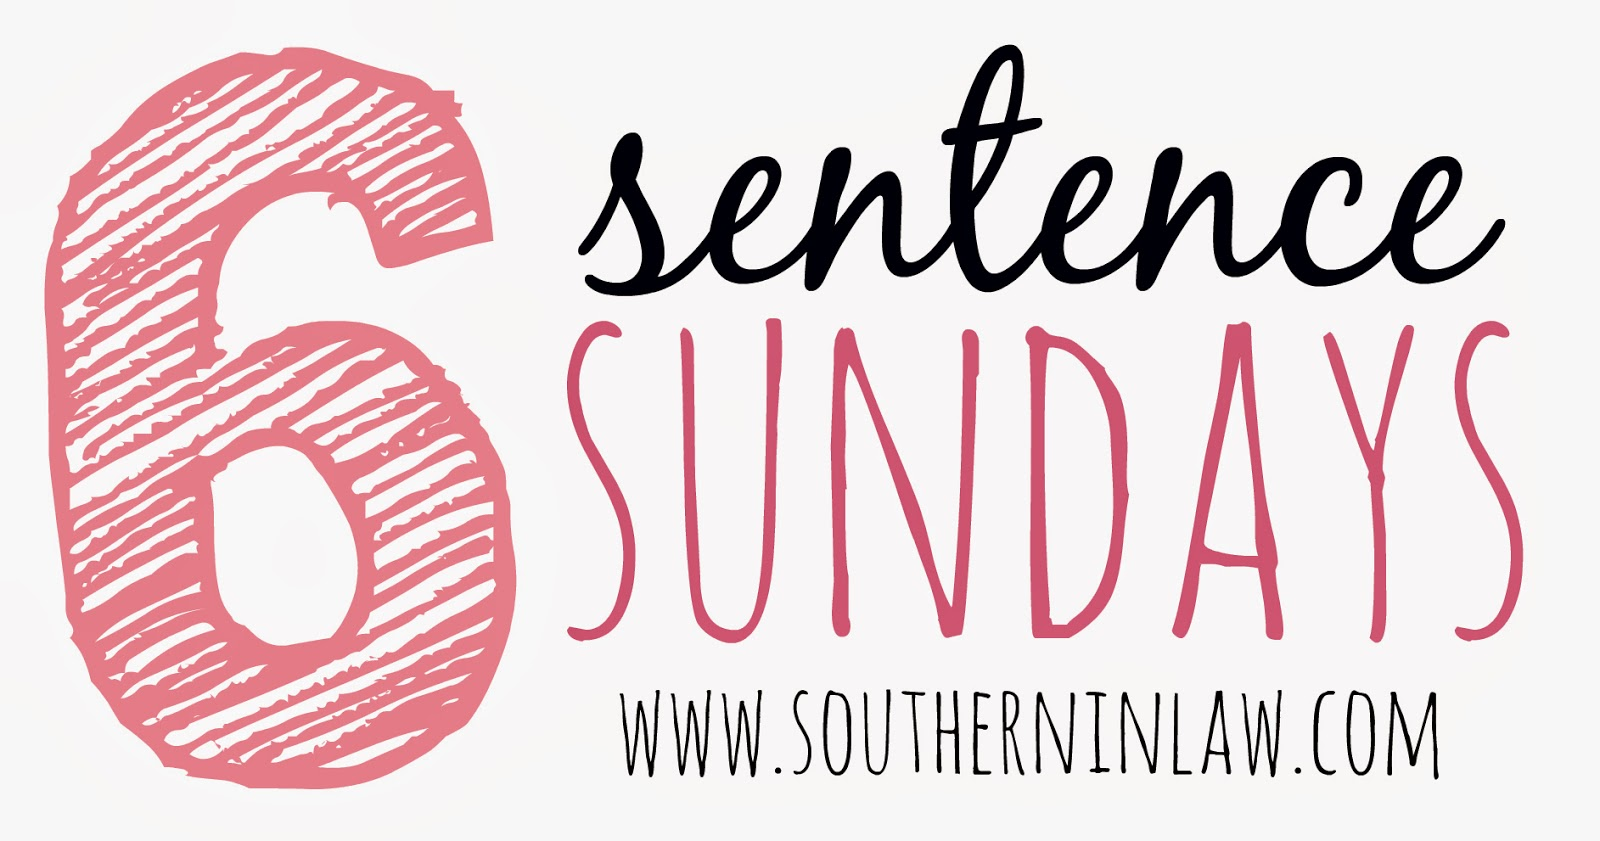 6 Sentence Sundays